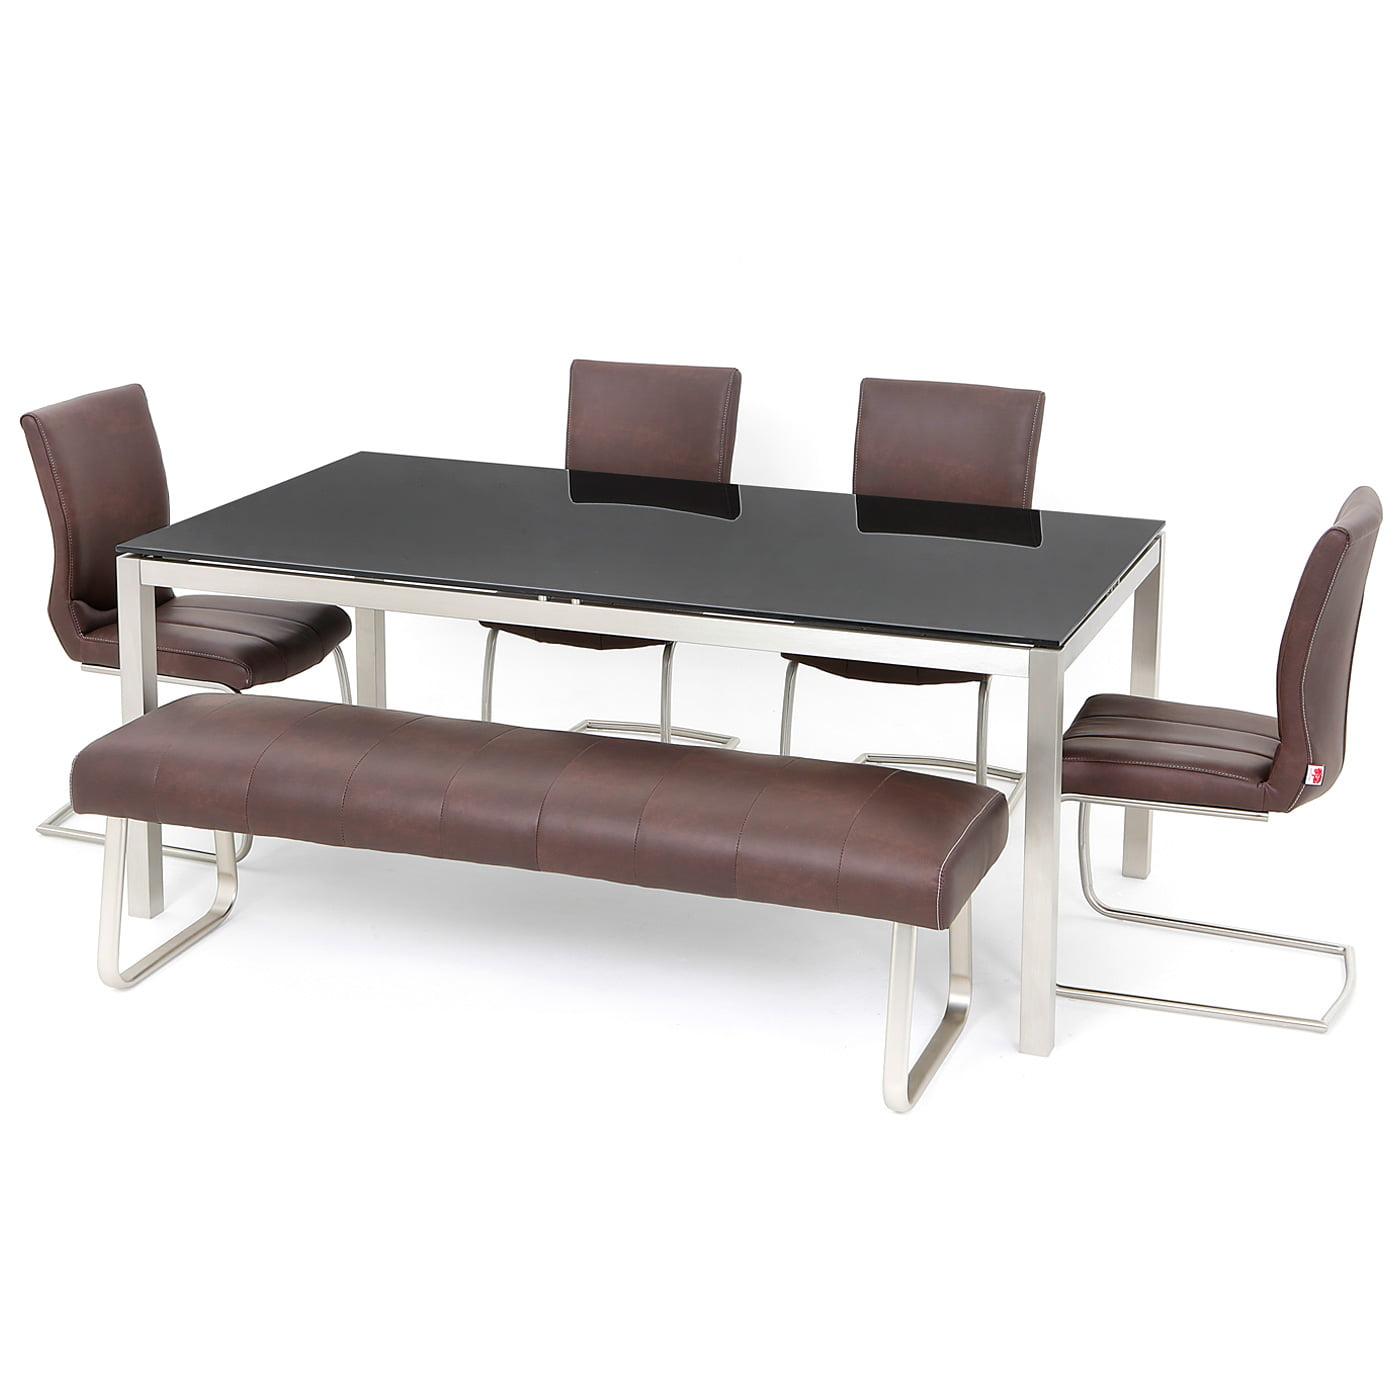 Milzano 1 8m Black Glass Table Redtree Furniture